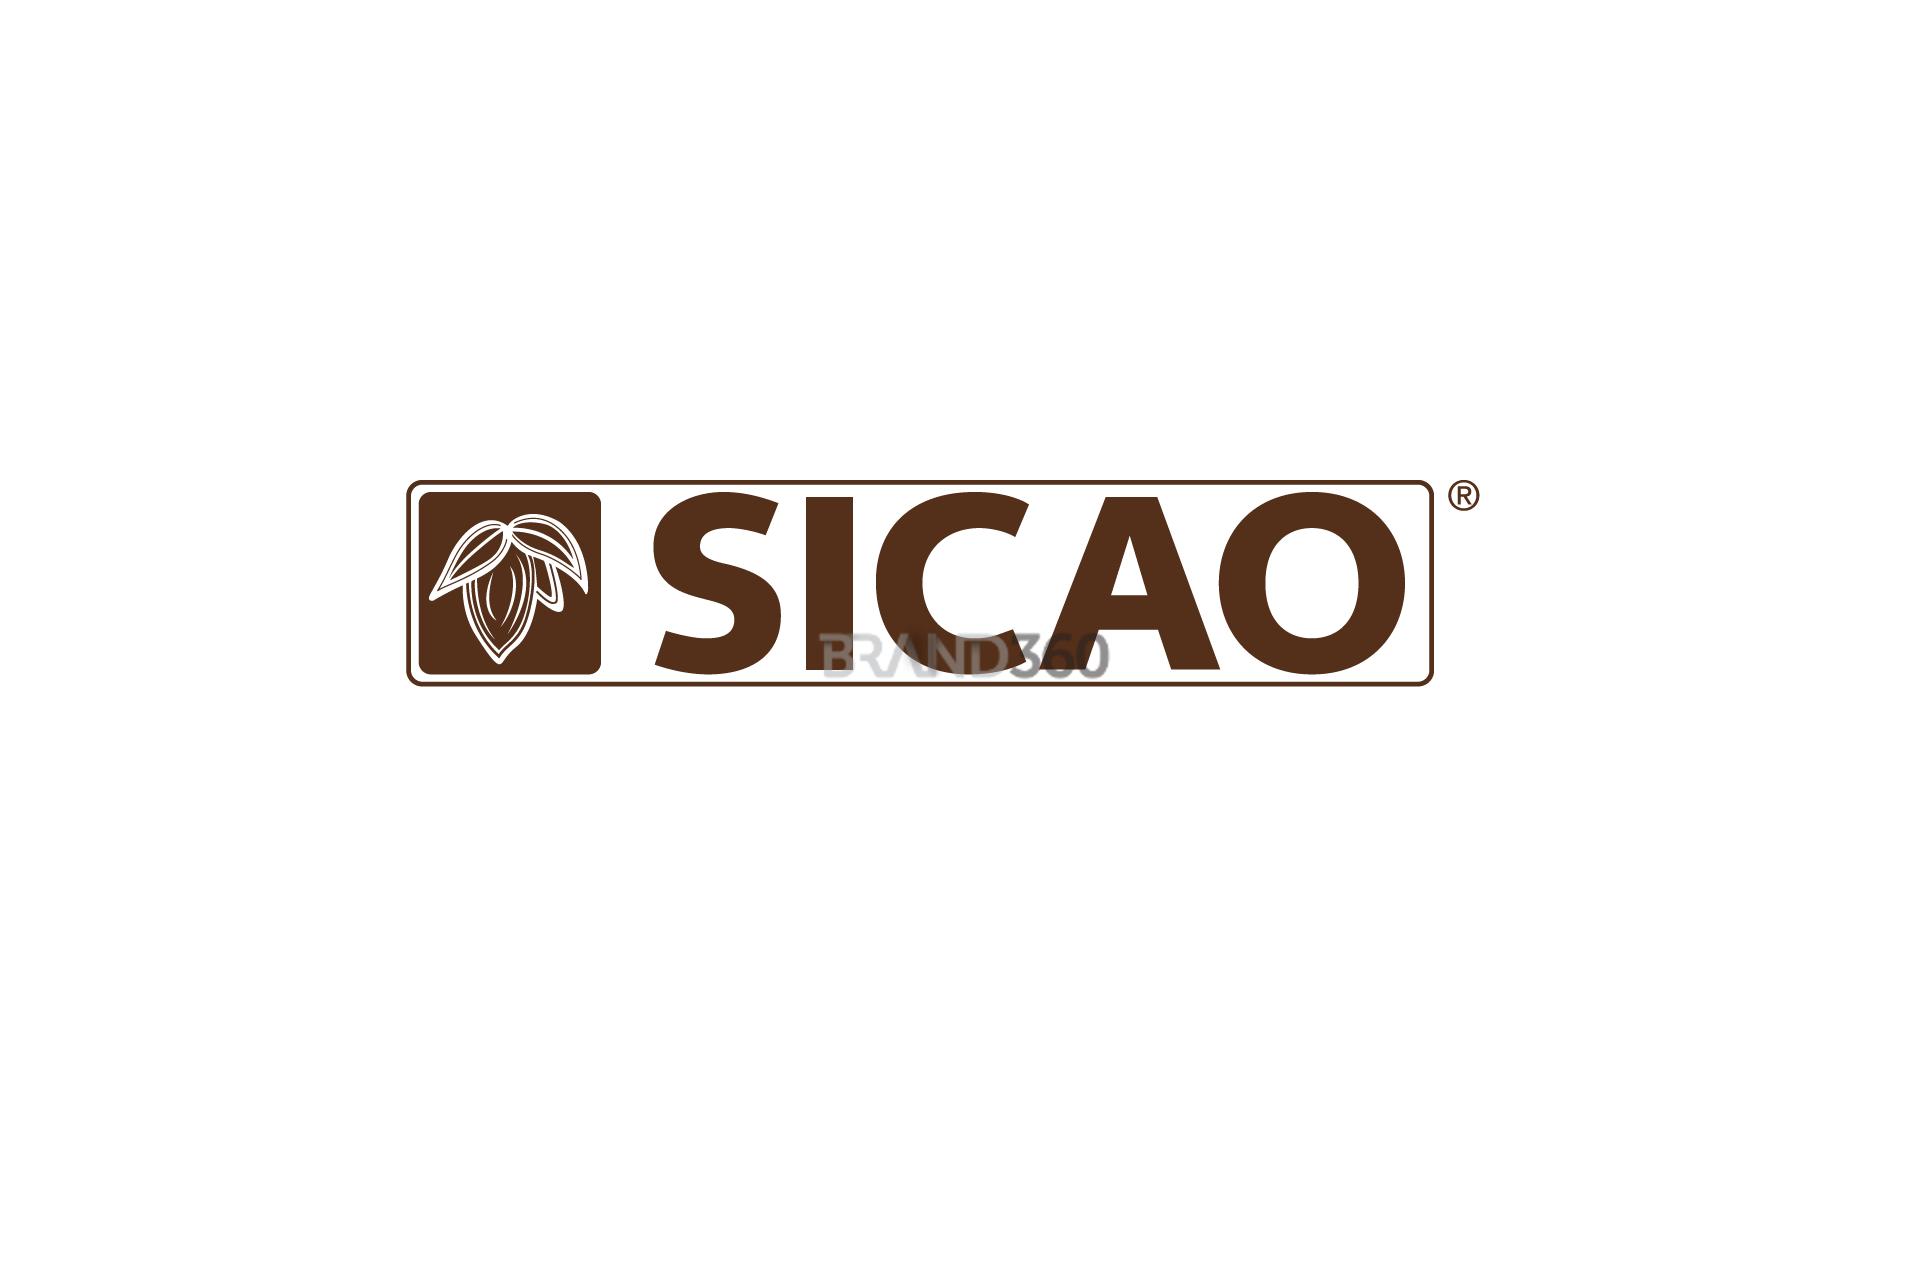 sicao-oldlogo-1920